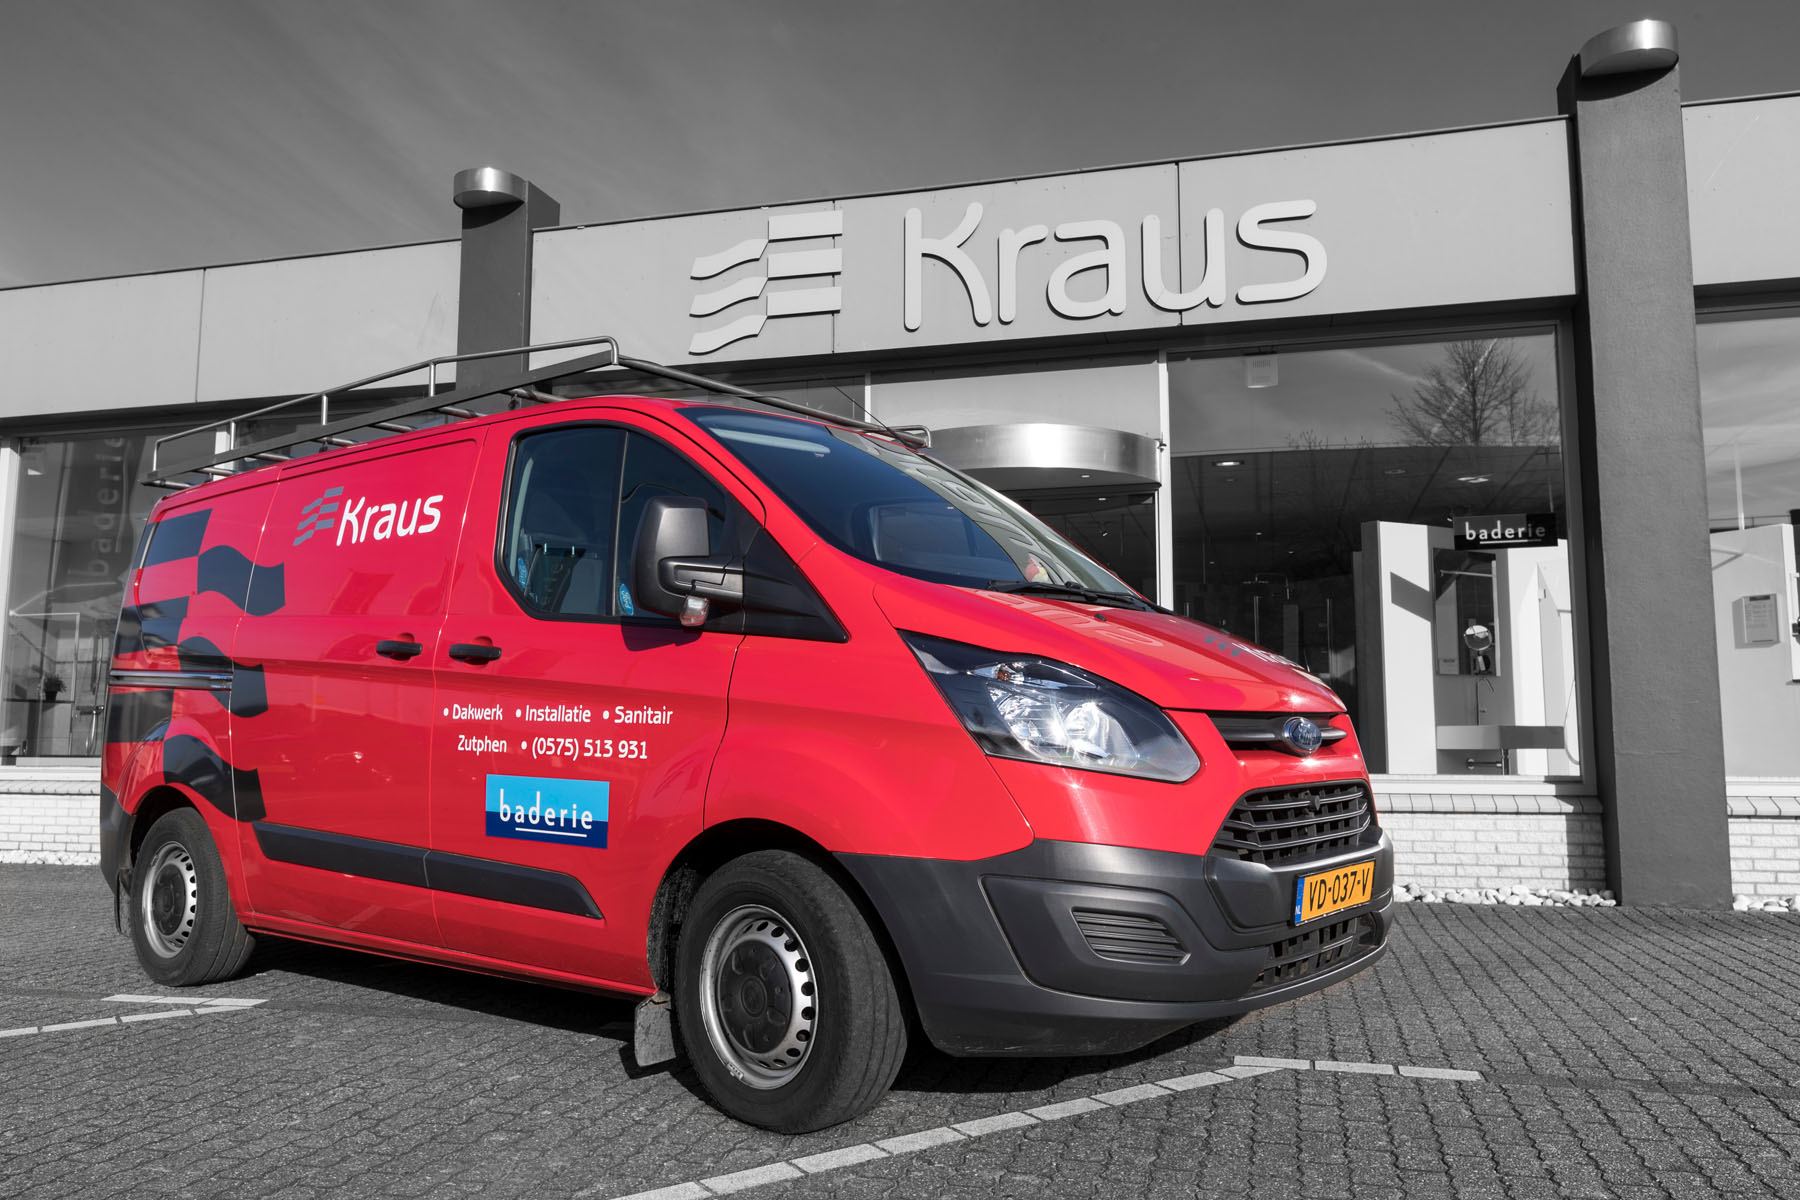 Badkamer Showroom Zutphen : Kraus baderie bedrijvenkring zutphen